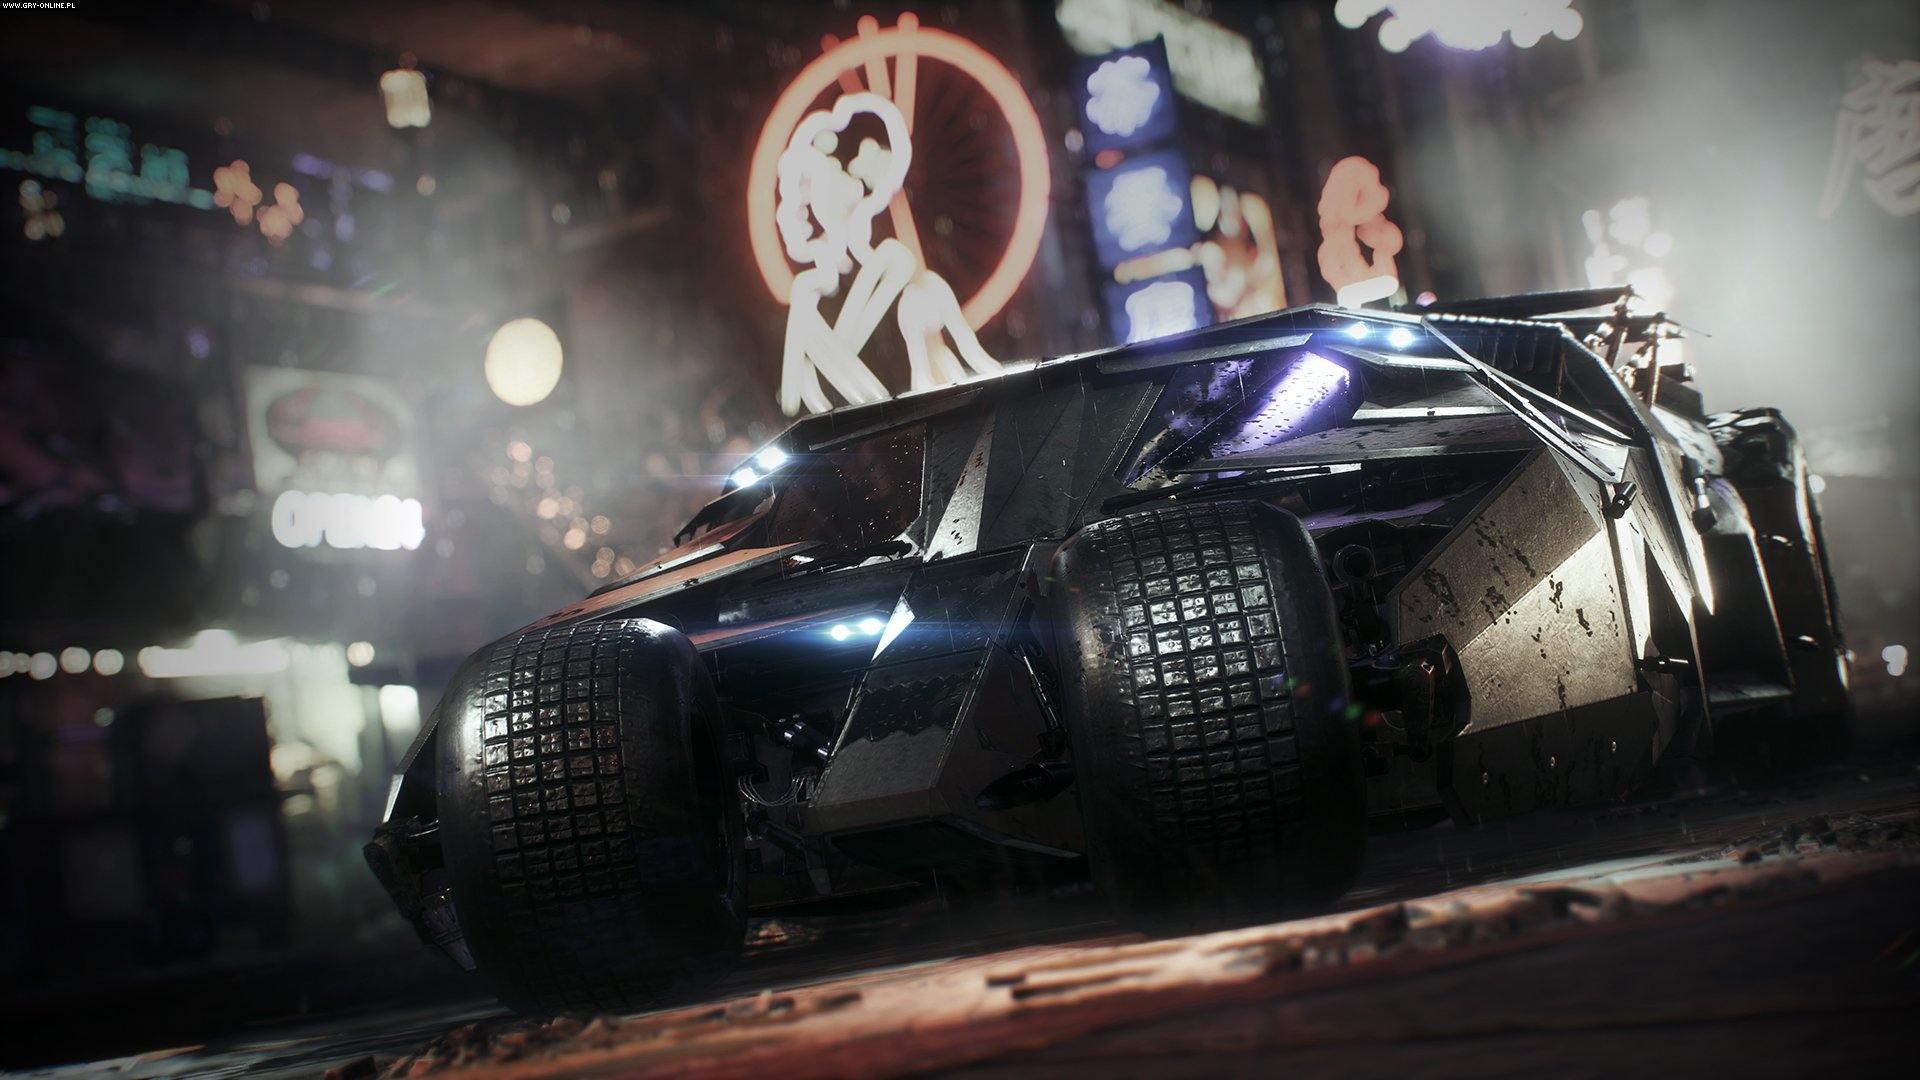 Batman Arkham Knight image #4